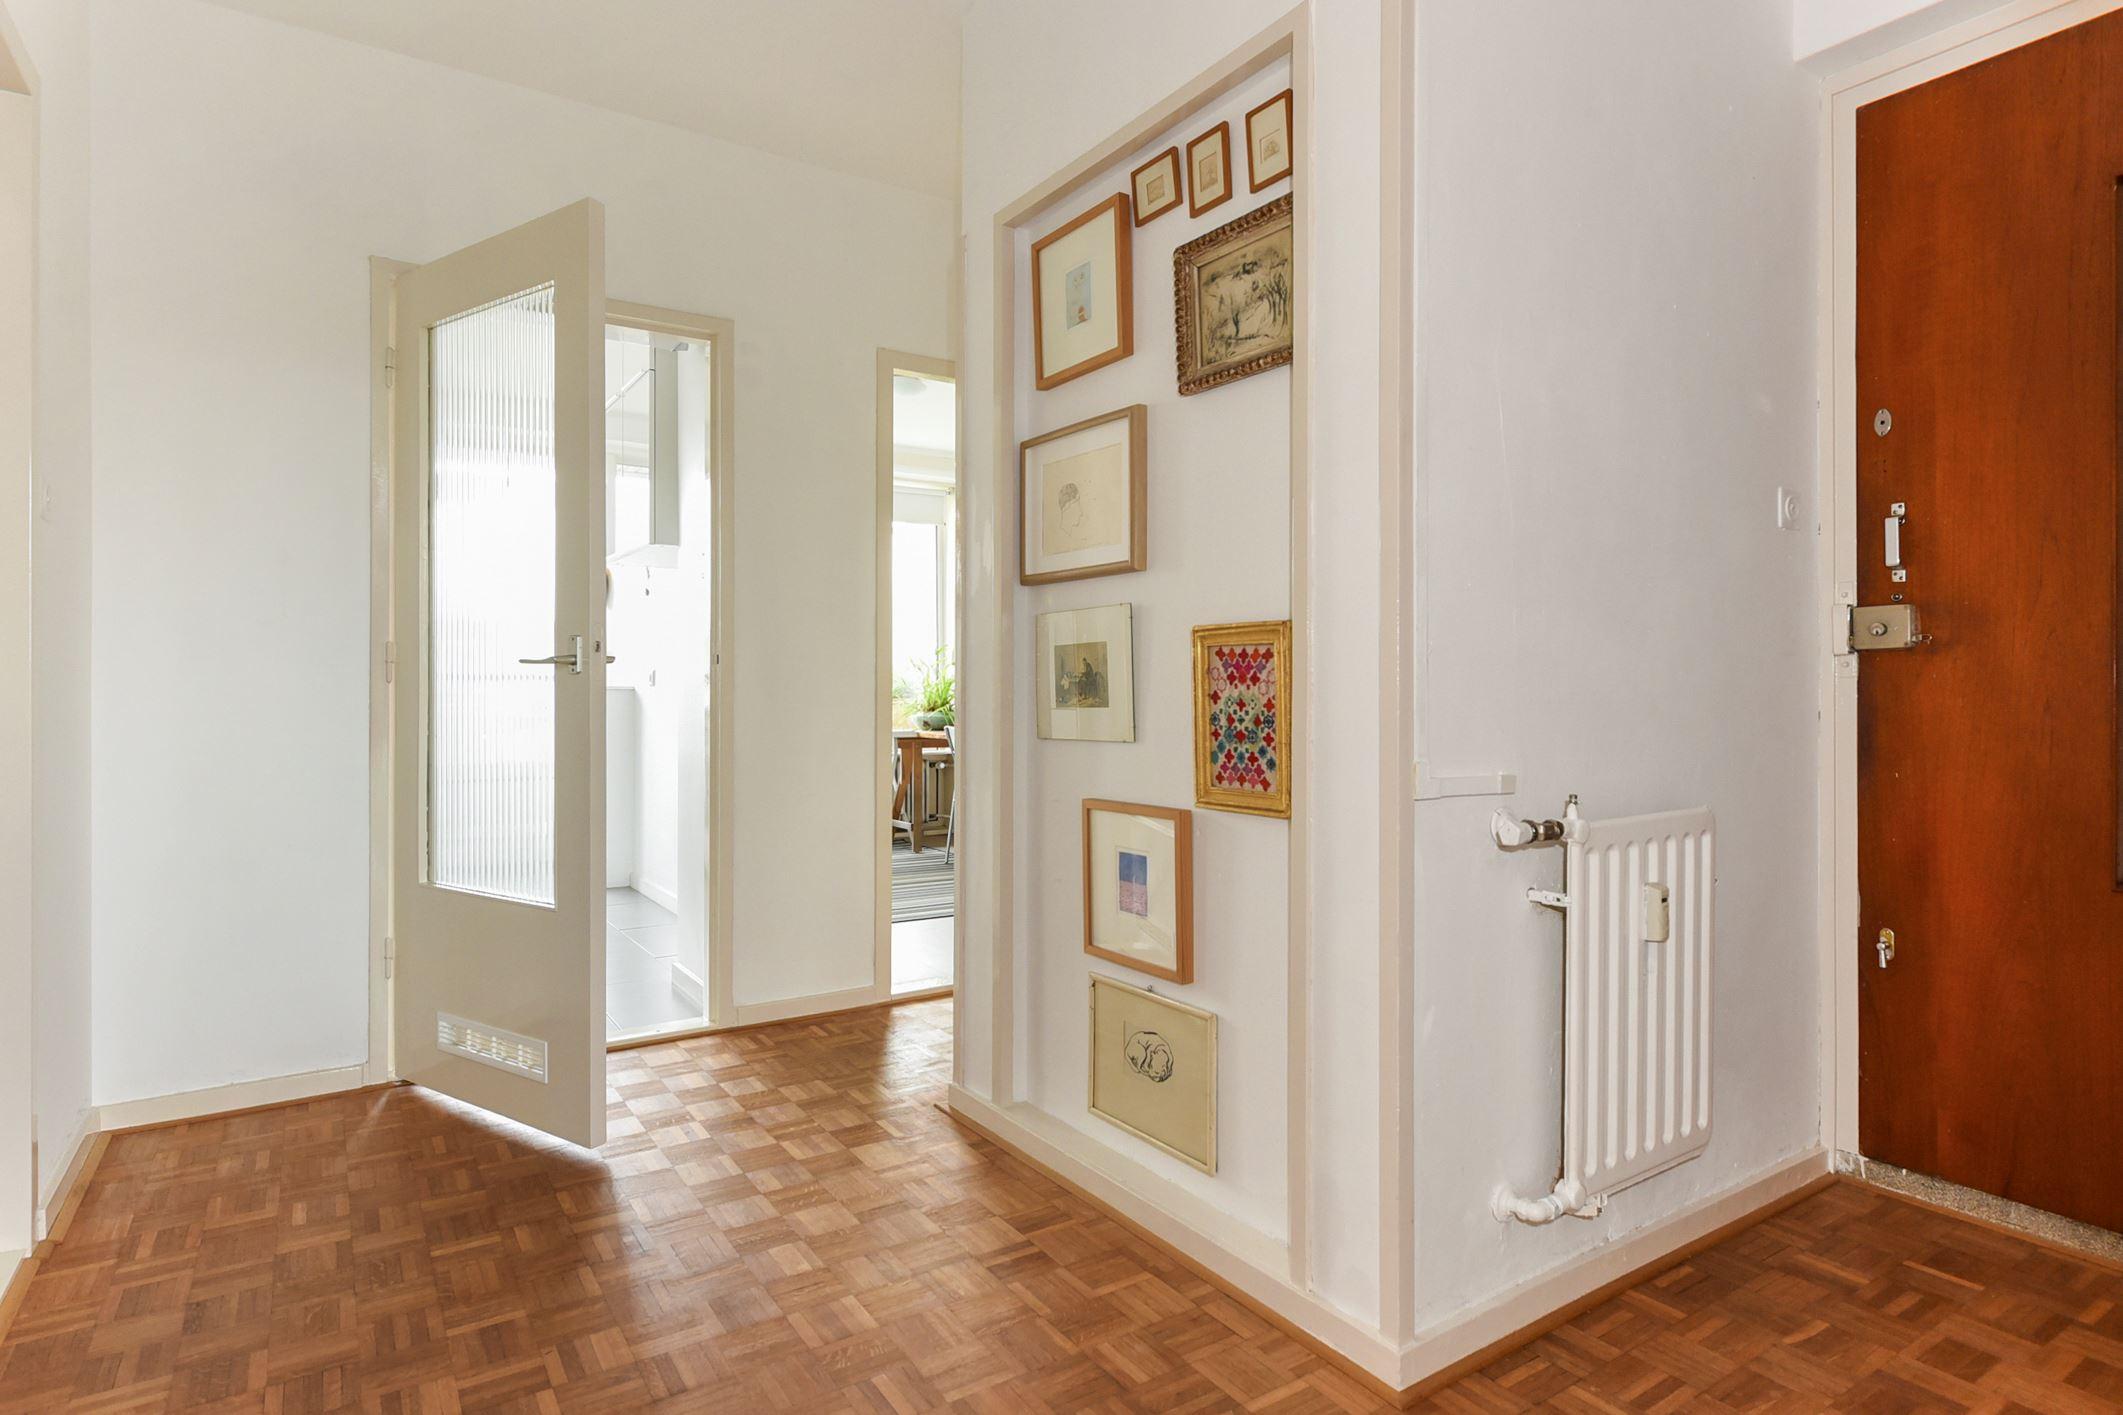 Apartment for sale: parelmoerhorst 57 2592 sc den haag [funda]